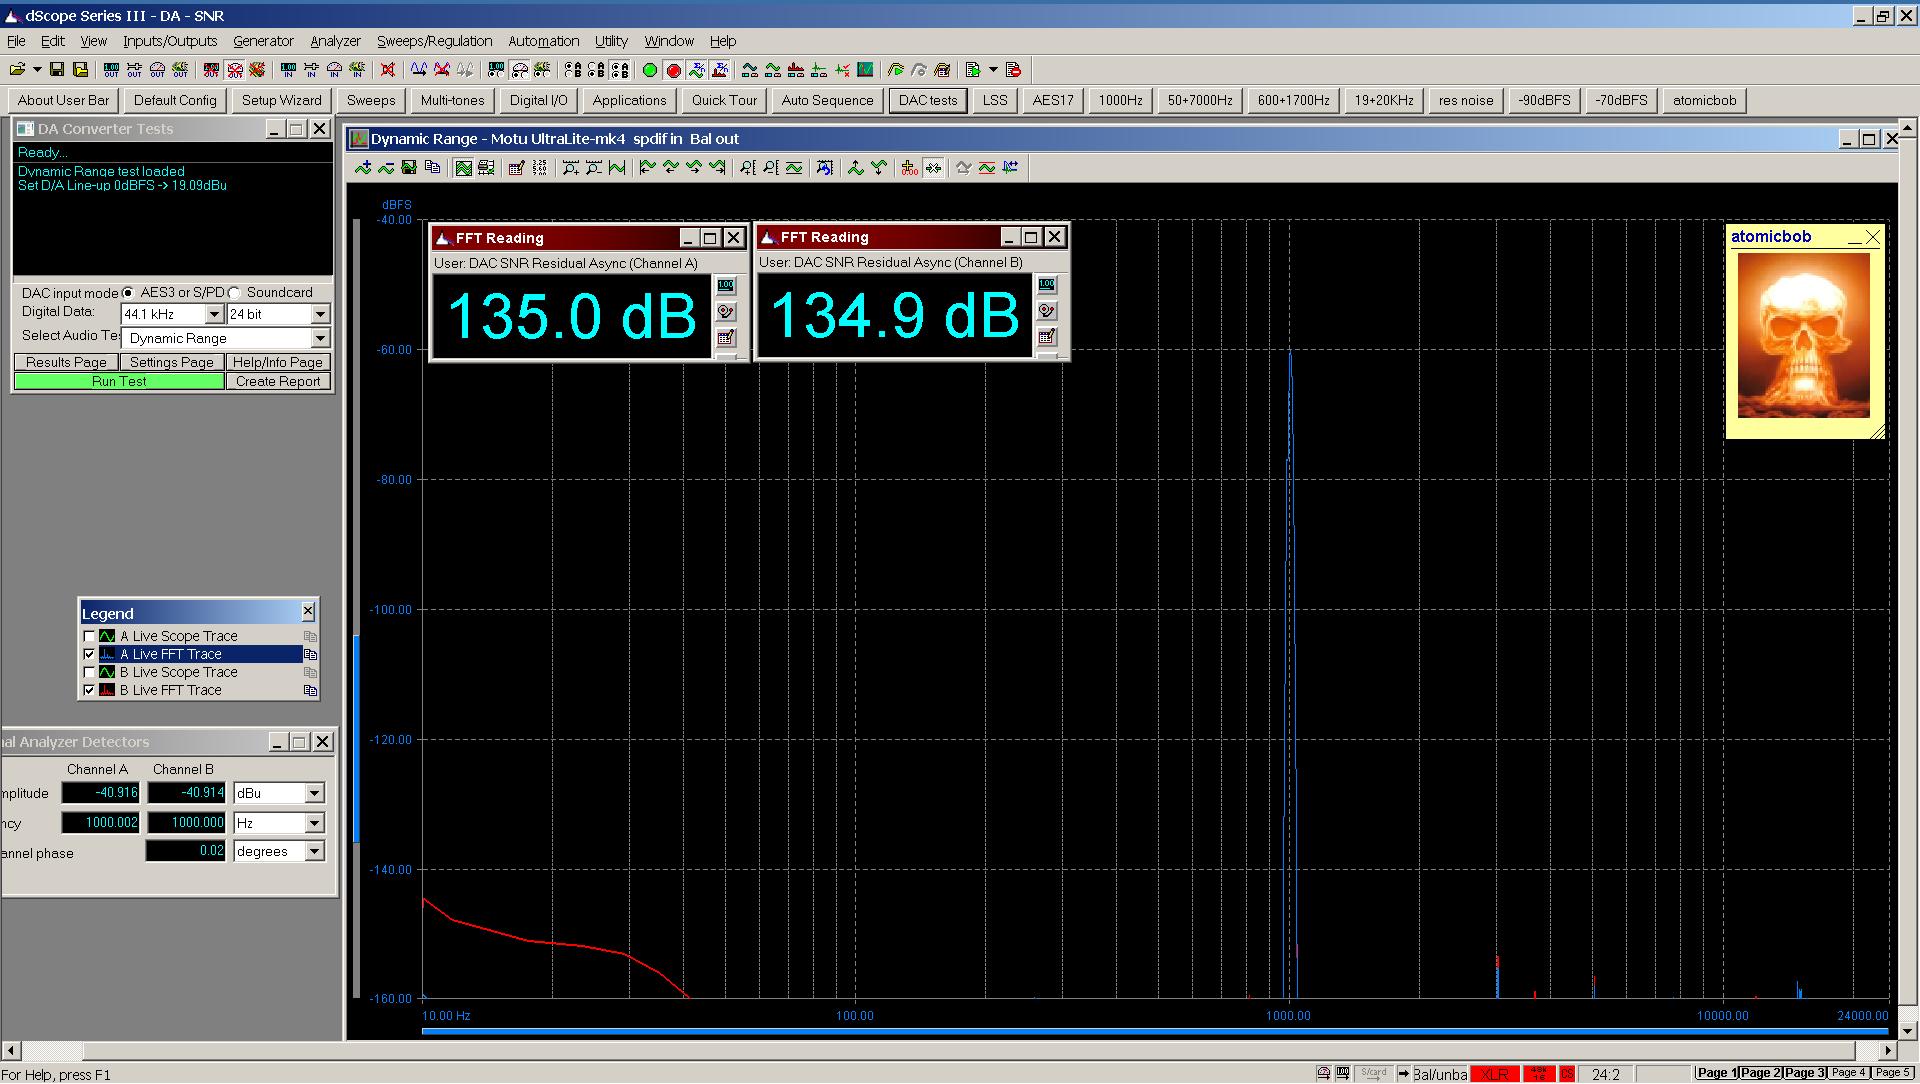 20200523 UltraLite-mk4 dynamic range FFT spdif Bal.png